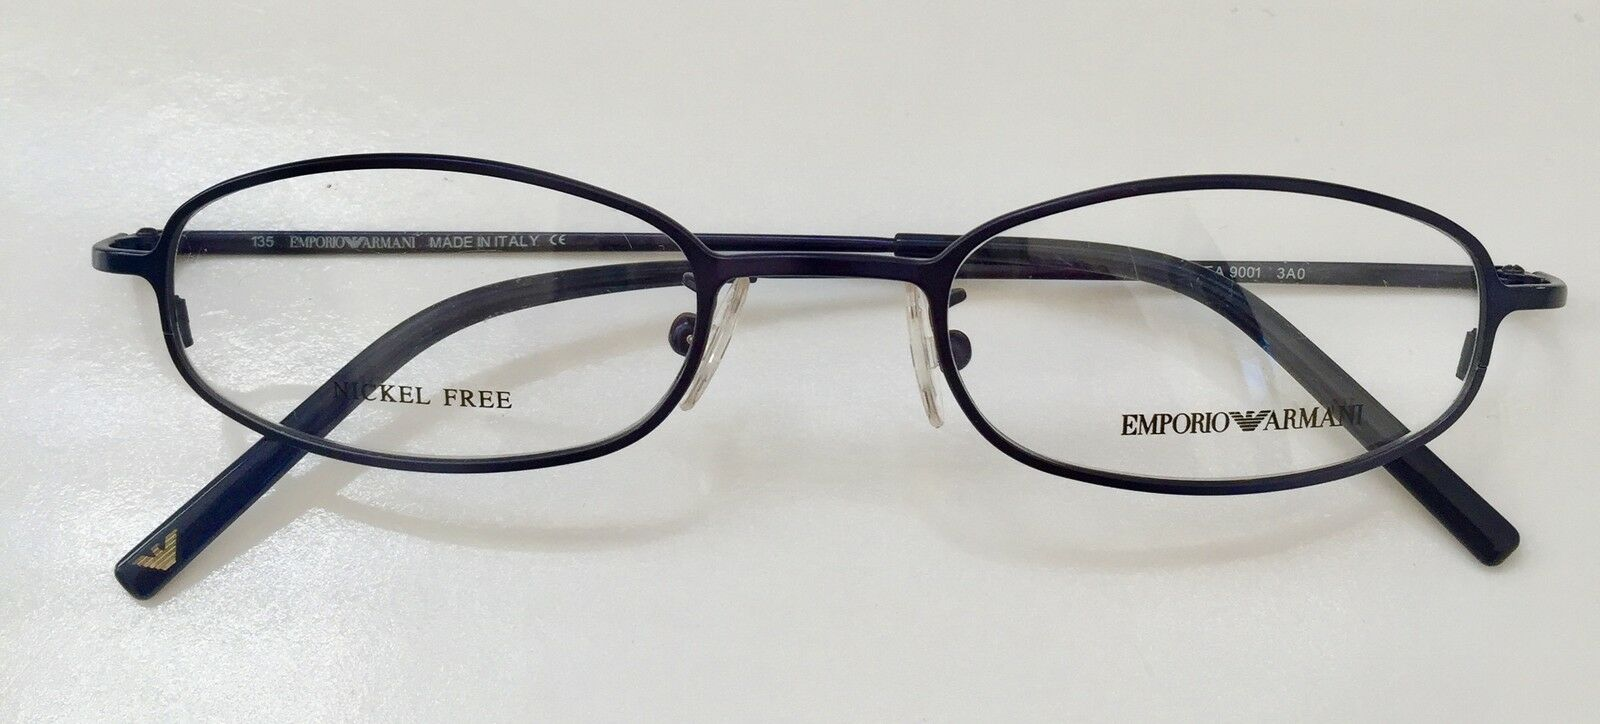 9b1974dcb87d Emporio Armani EA 9001 Eyeglasses Lunette Brille Occhiali Gafas ...